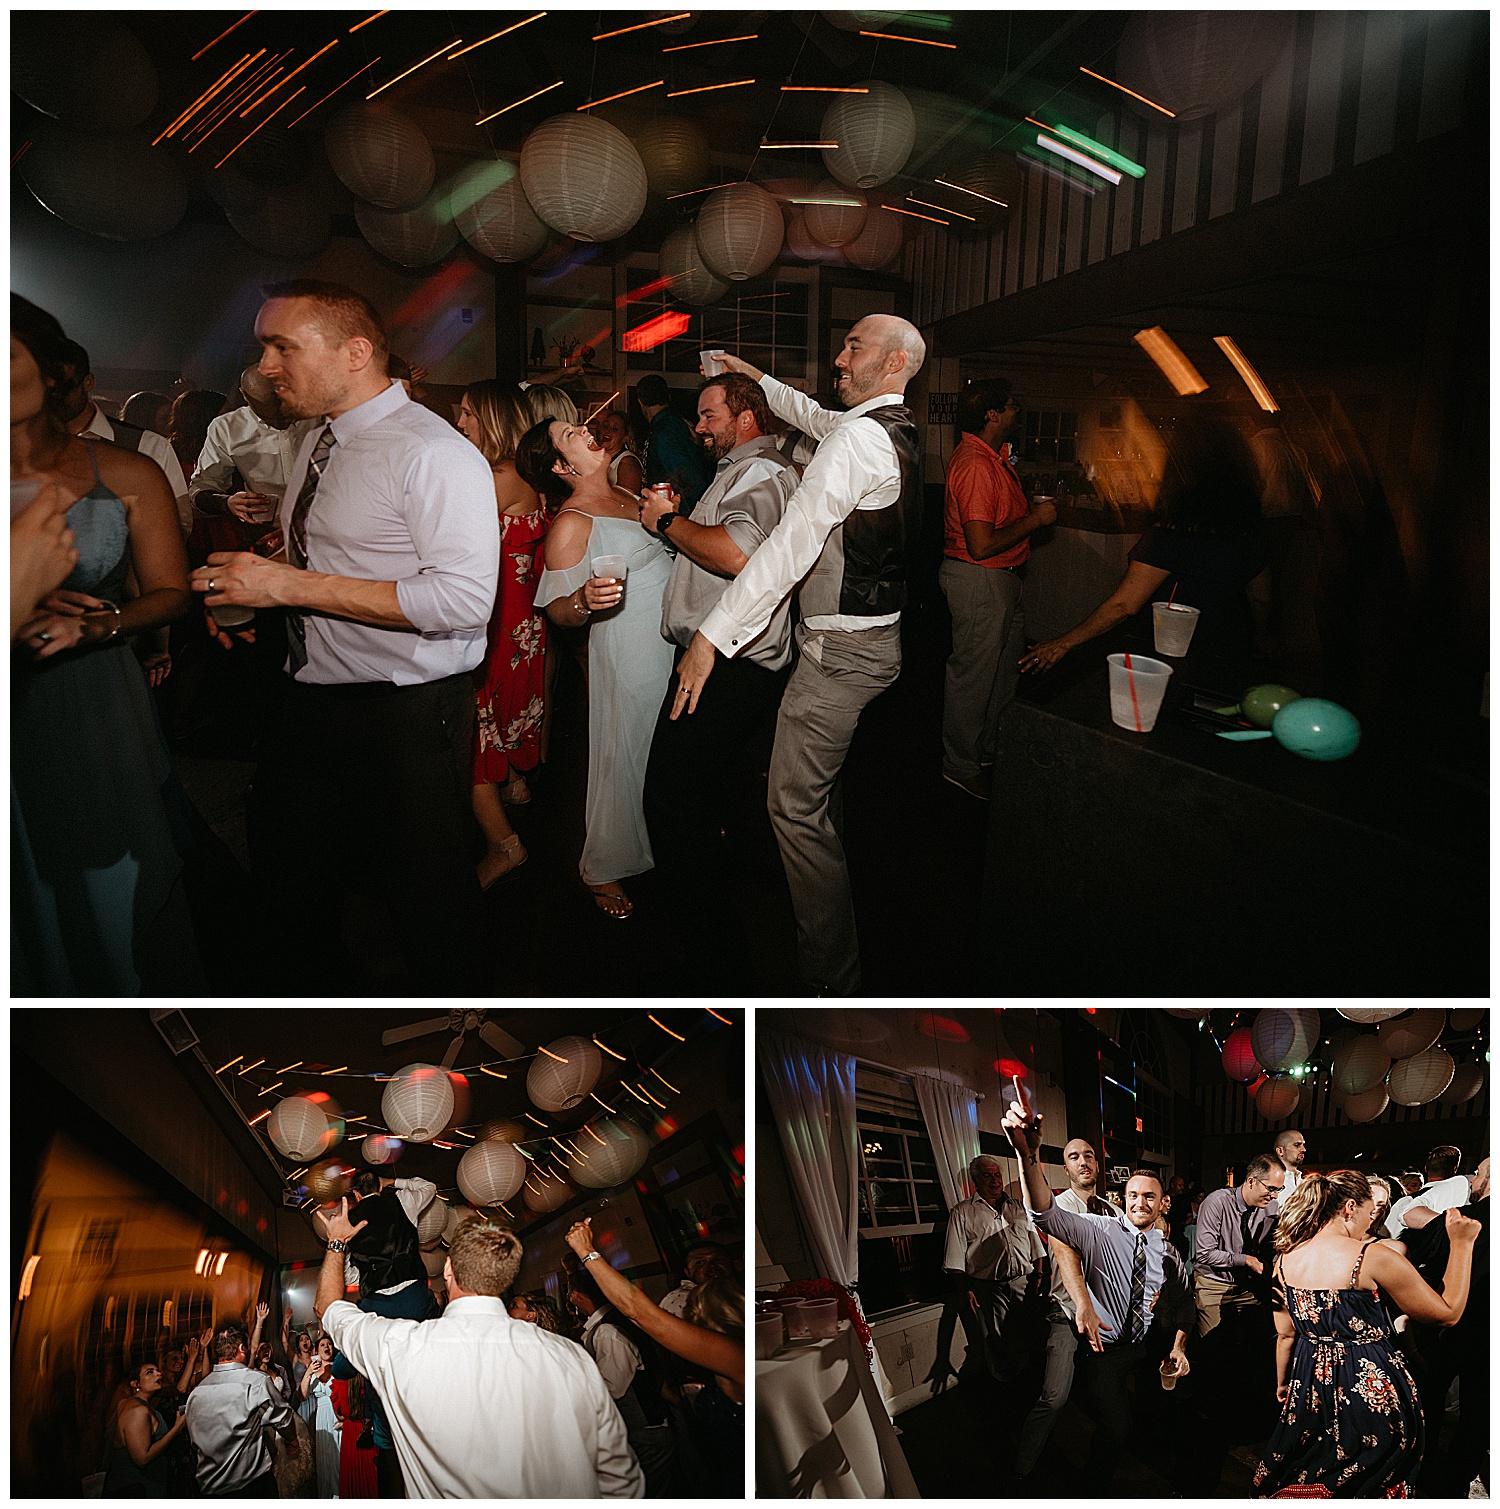 NEPA-Bloomsburg-Wedding-Photographer-at-The-Barn-at-Boones-Dam-Bloomsburg-PA_0068.jpg